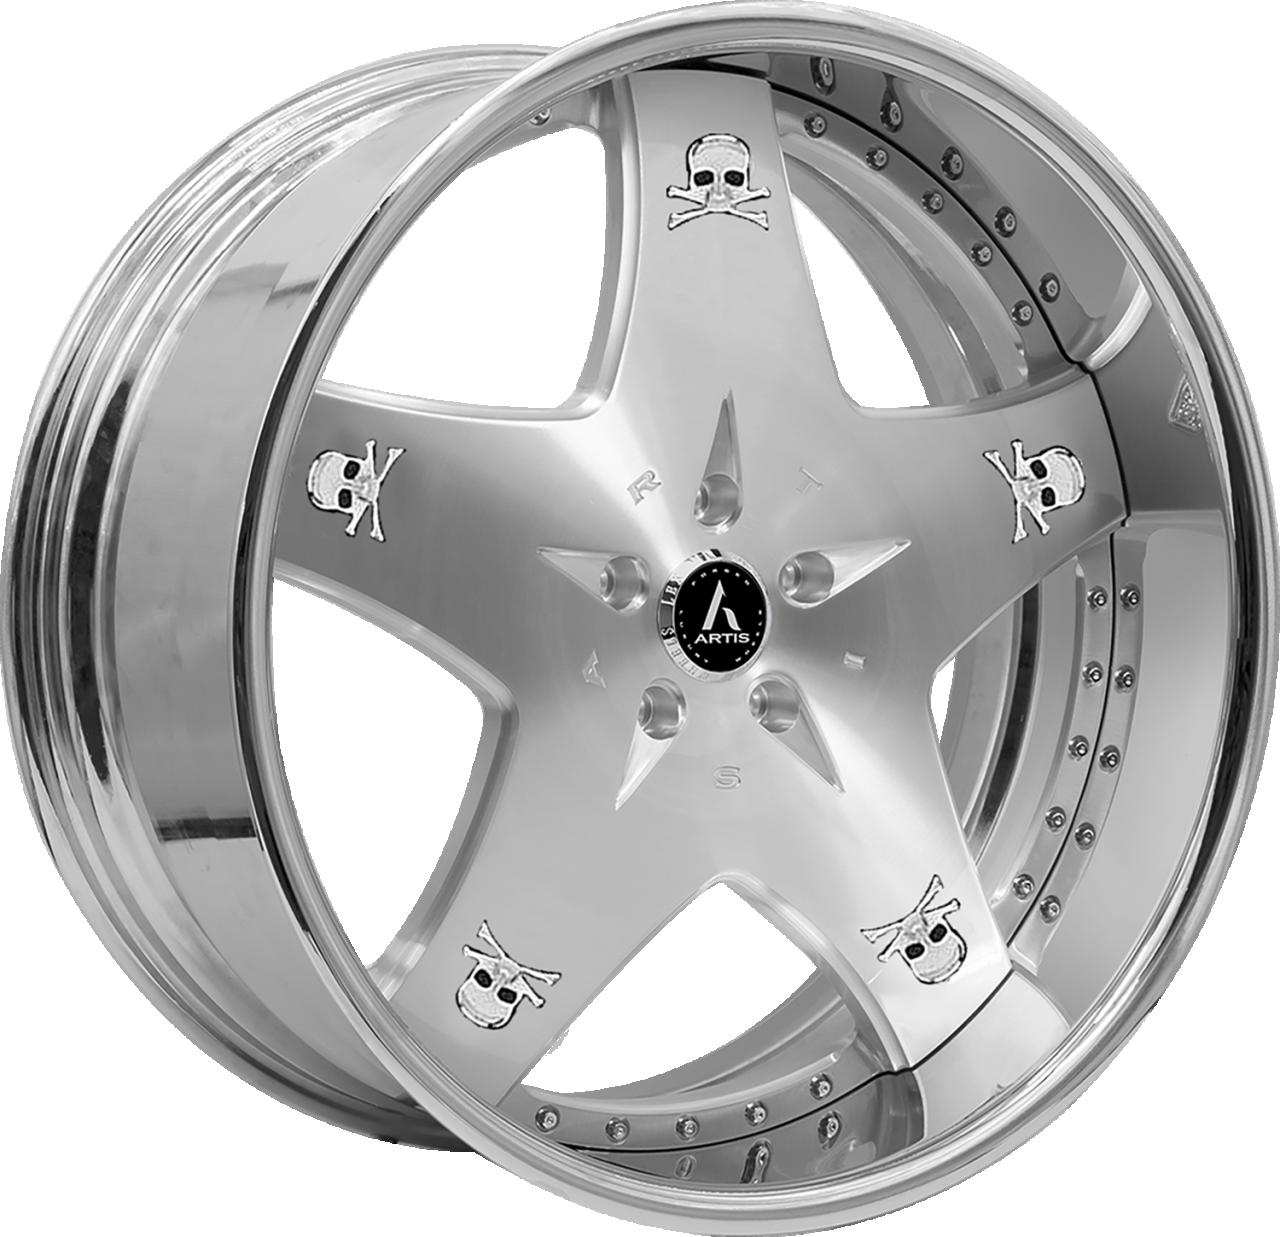 Artis Forged Cashville wheel with Brushed finish